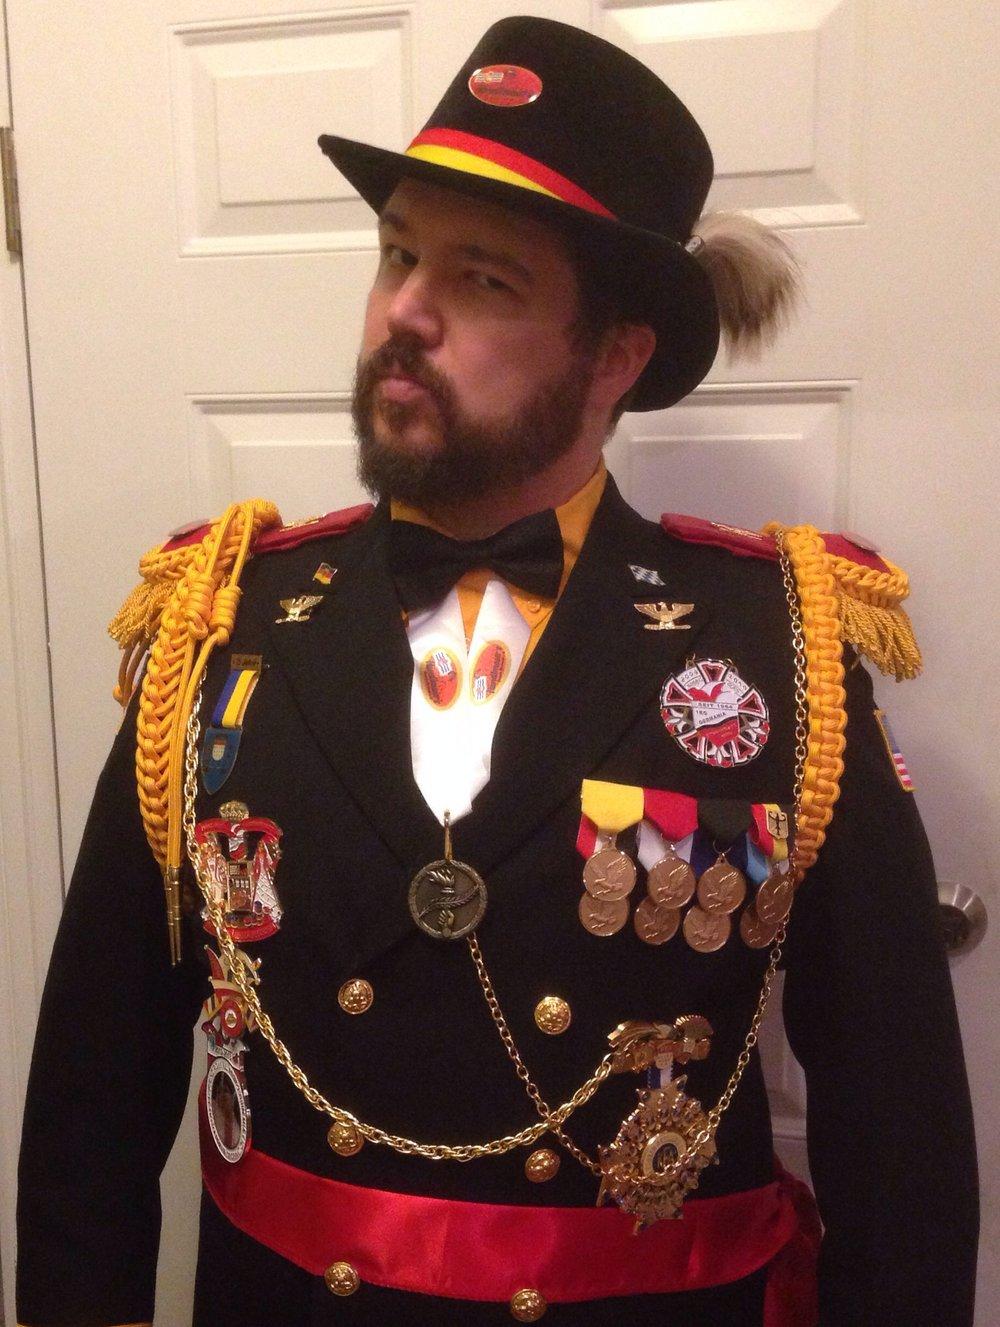 colonel_mustard.jpeg